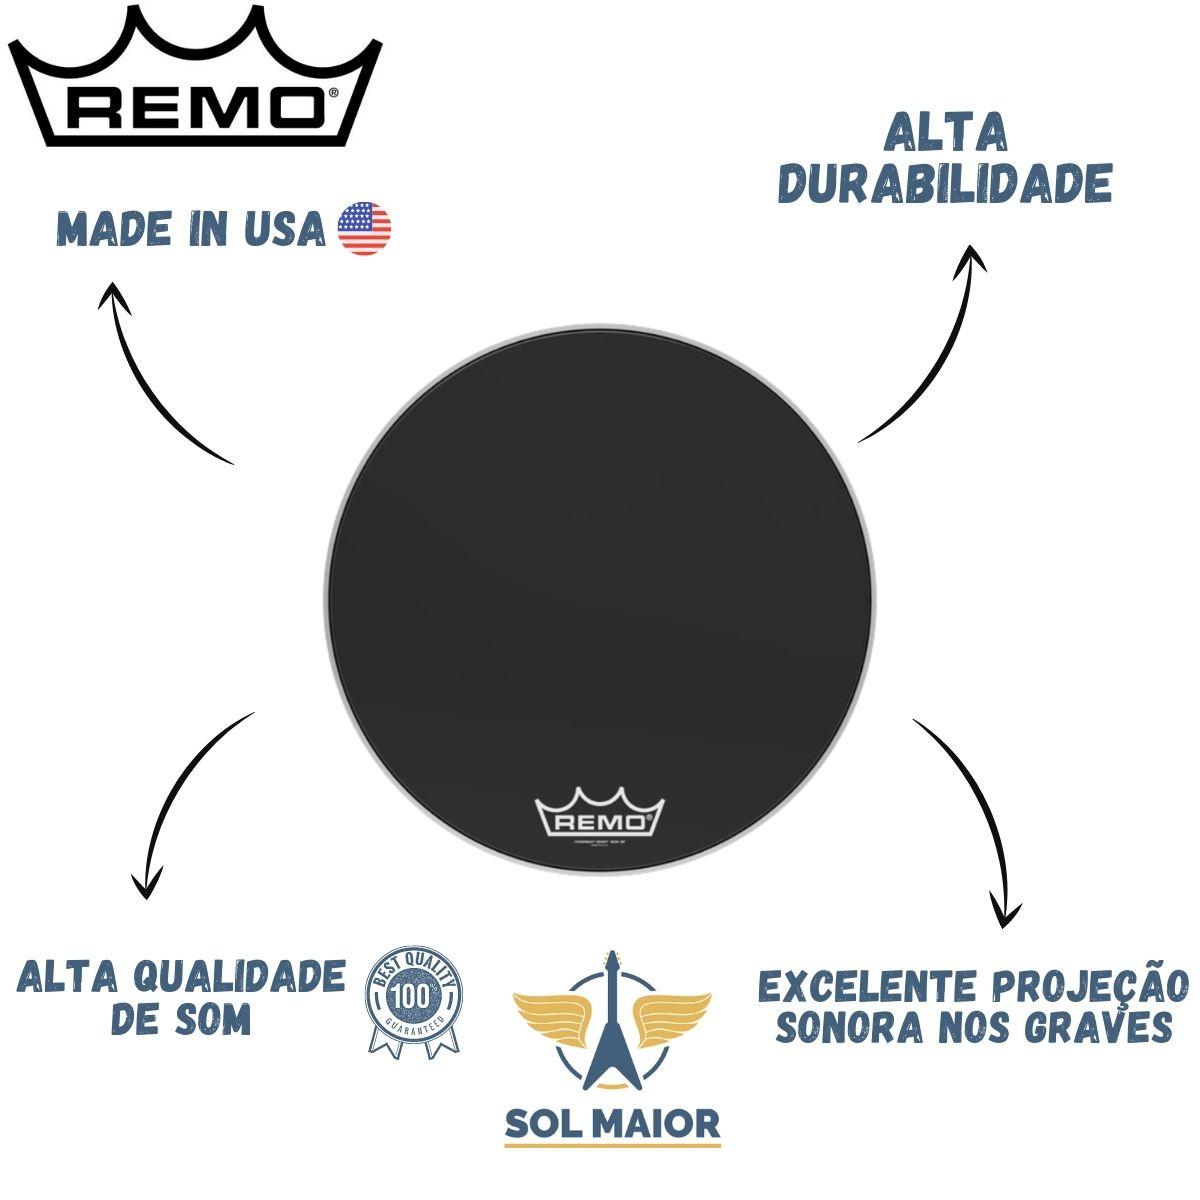 "Pele Remo de Bumbo Marcial 24"" Powermax Ebony PM-1424-MP"